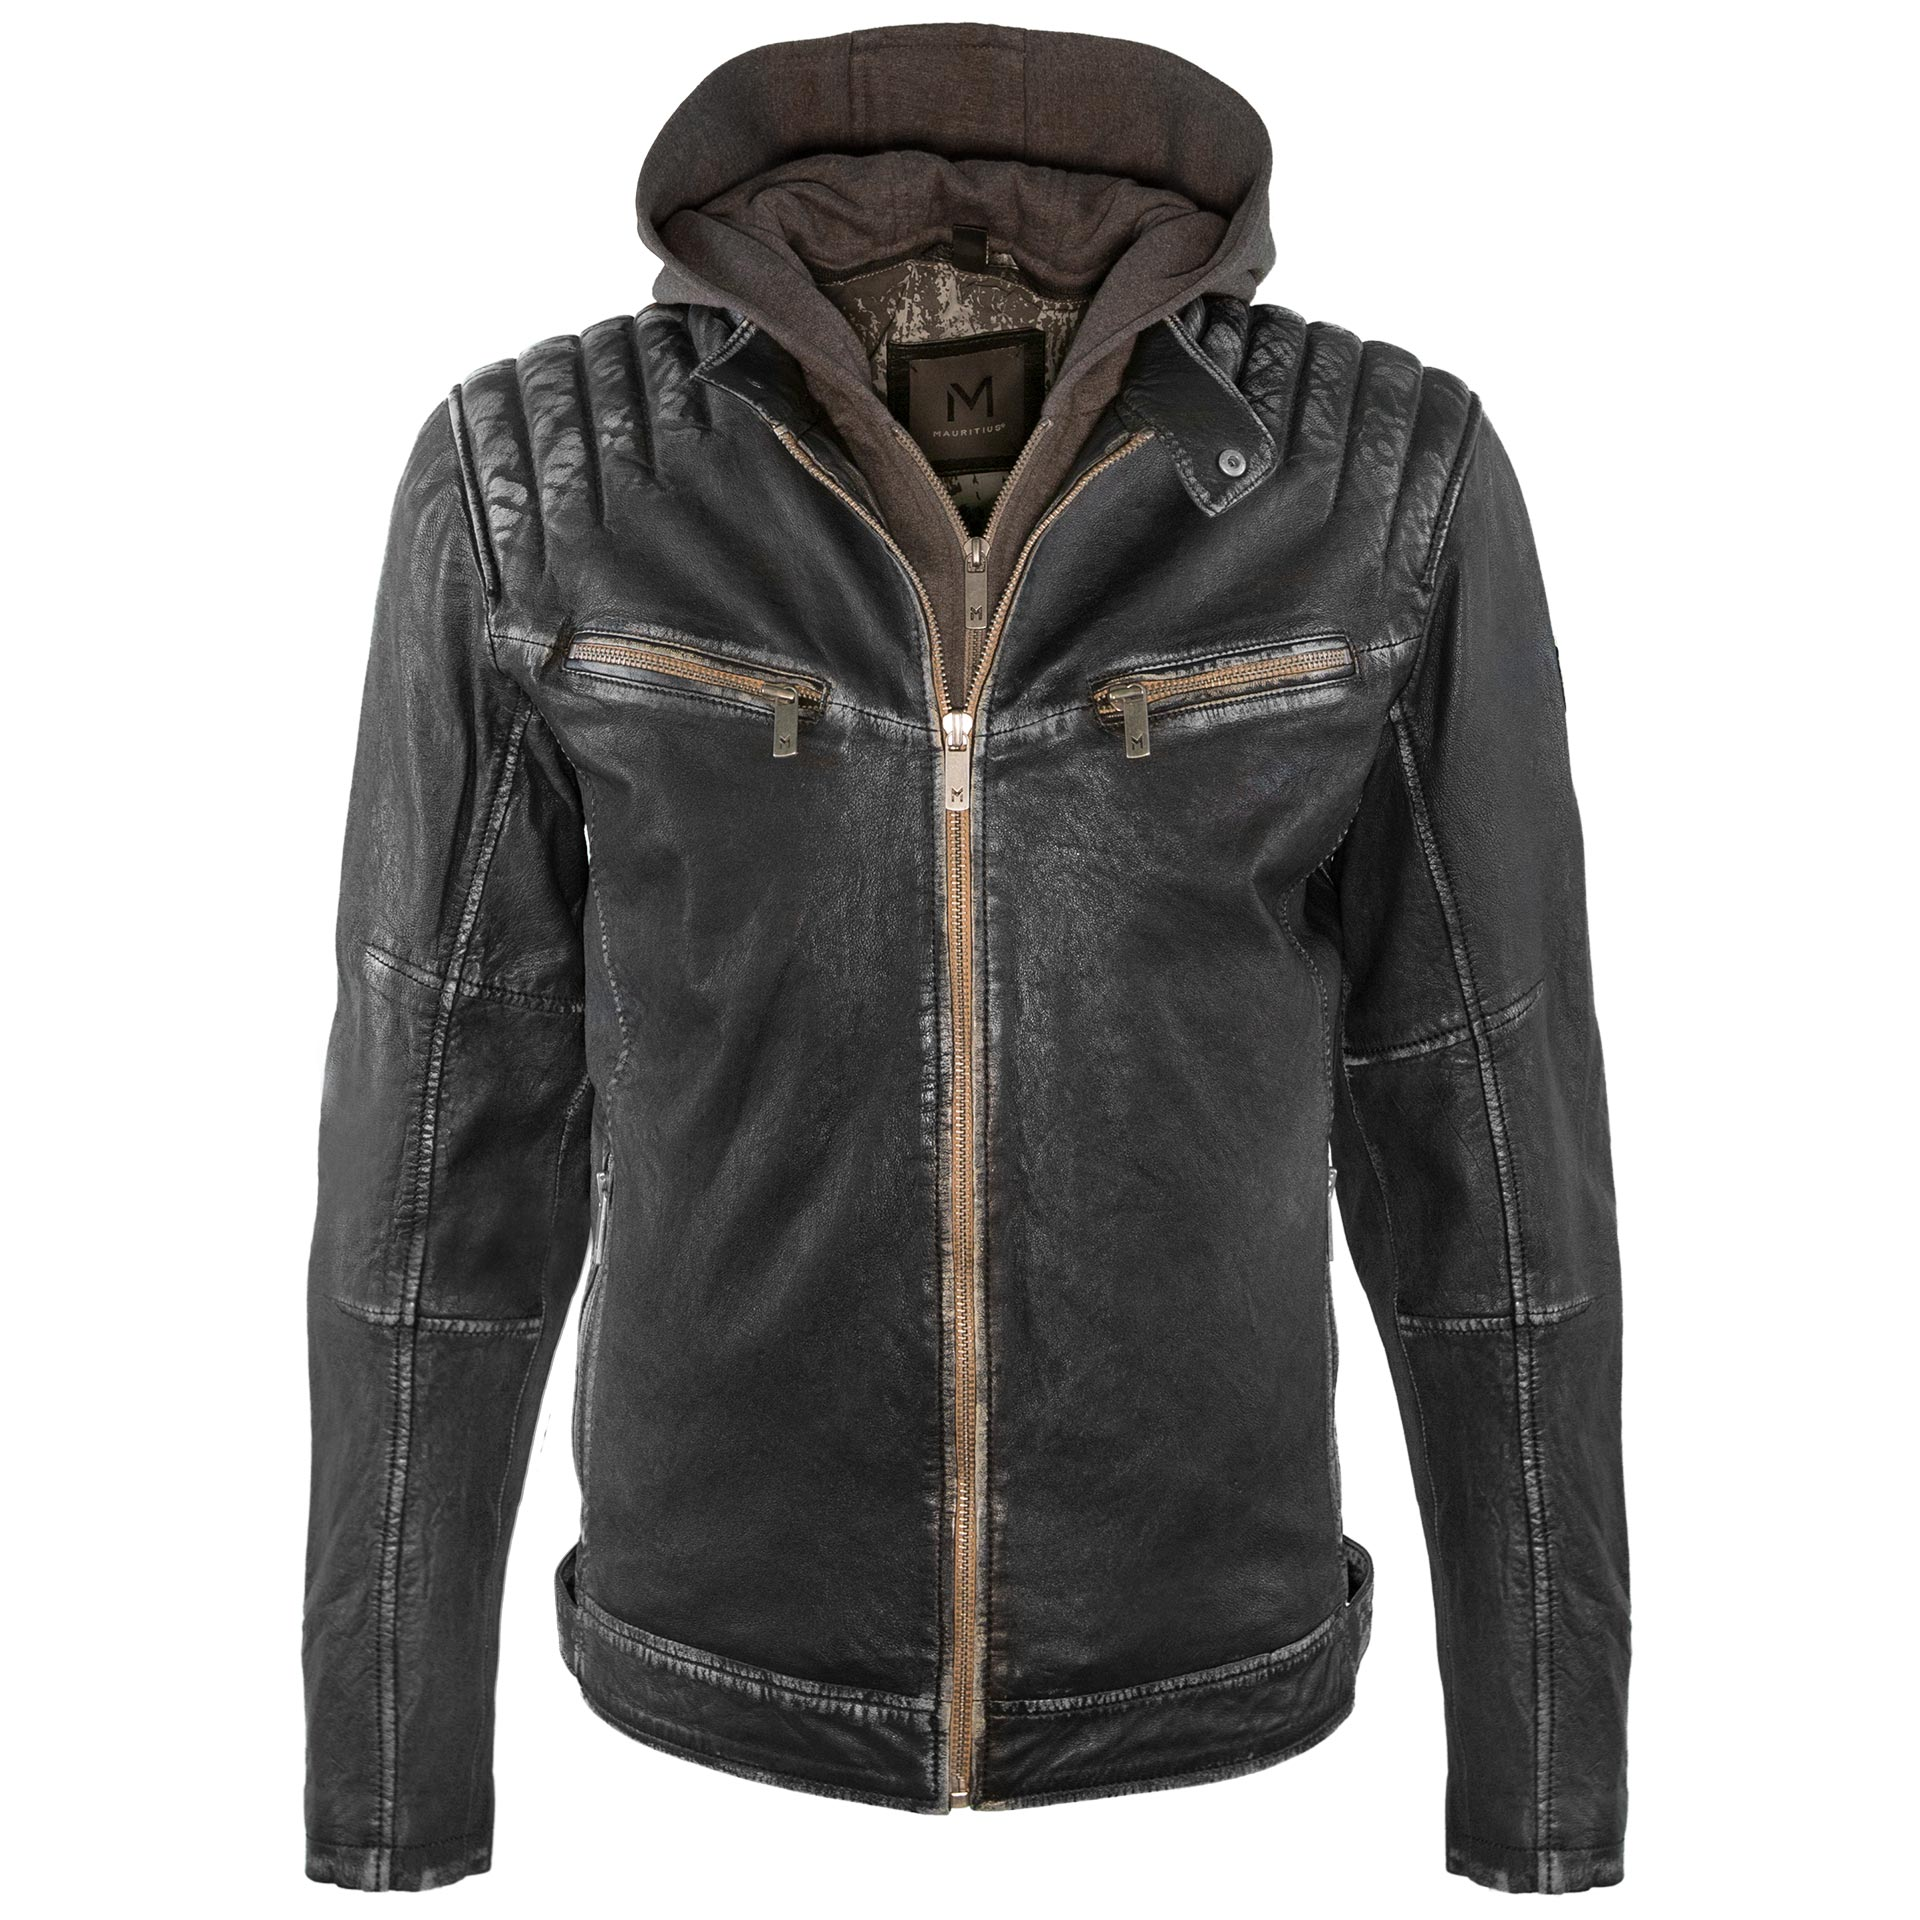 e9ca736dd MAURITIUS Men's Hooded Leather Jacket. Rio 2 sh. Fuji veg black 1.jpg